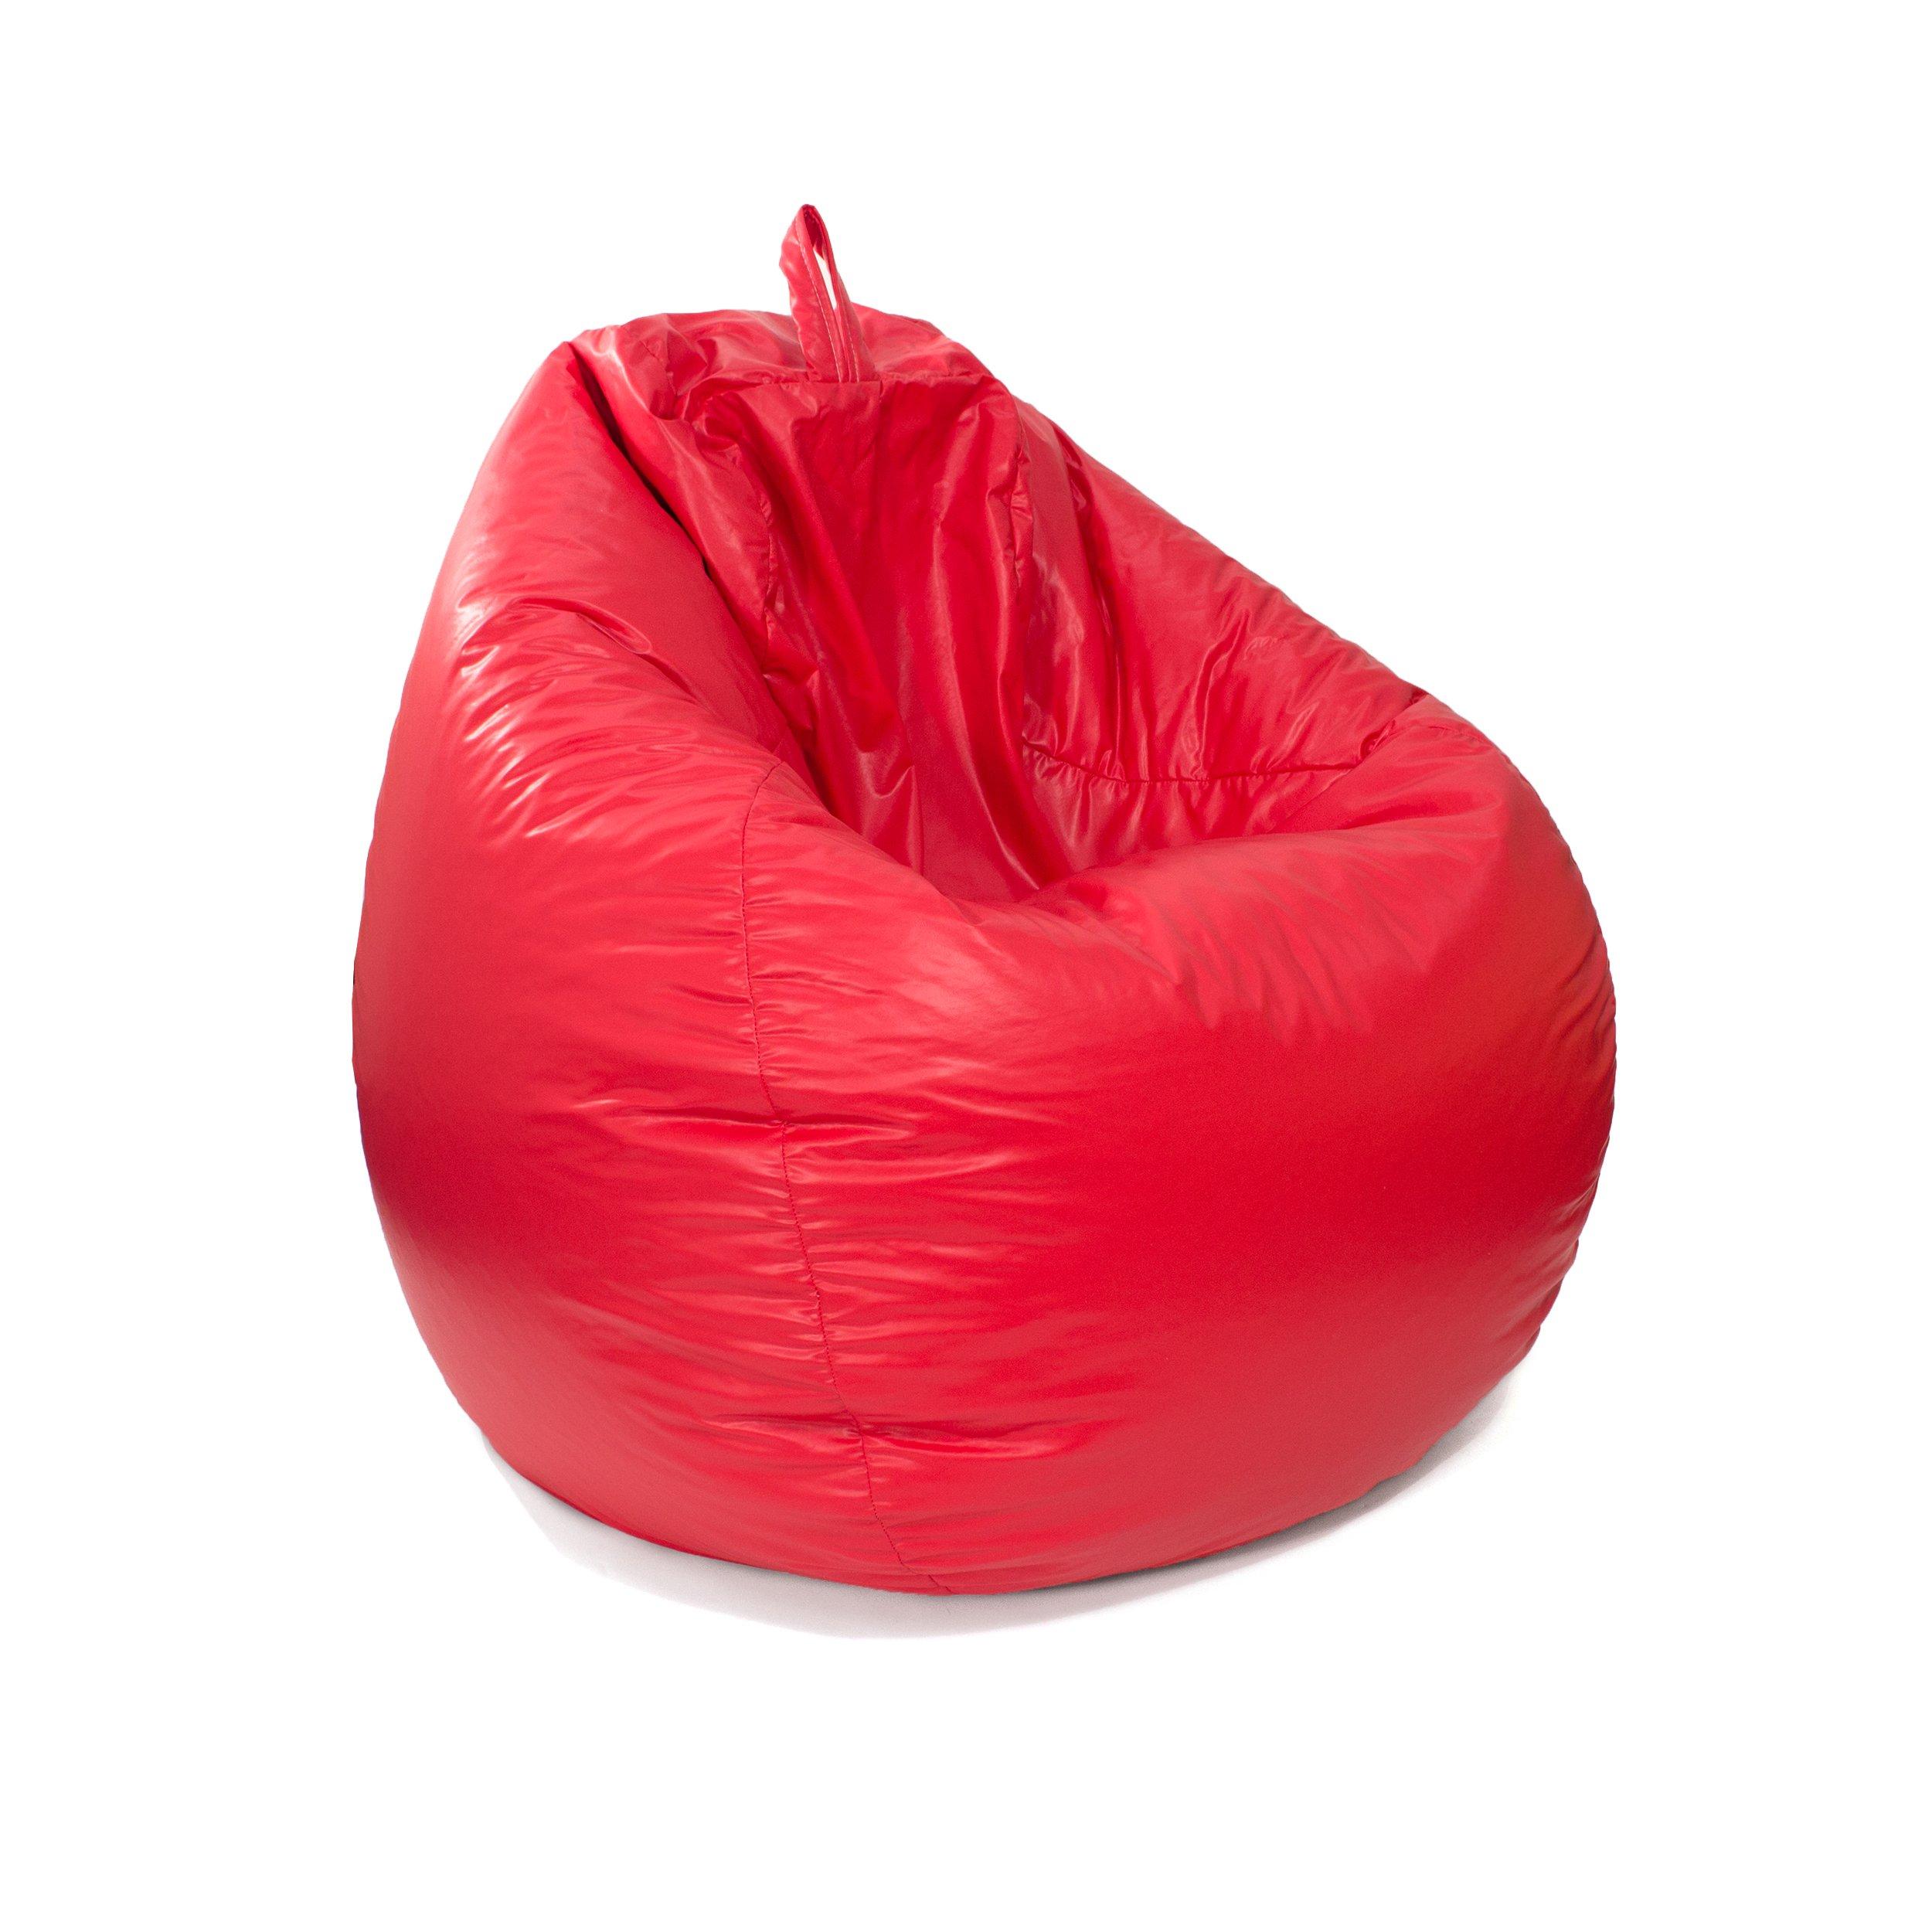 Gold Medal Bean Bags Leather look Tear Drop Bean bag - Red